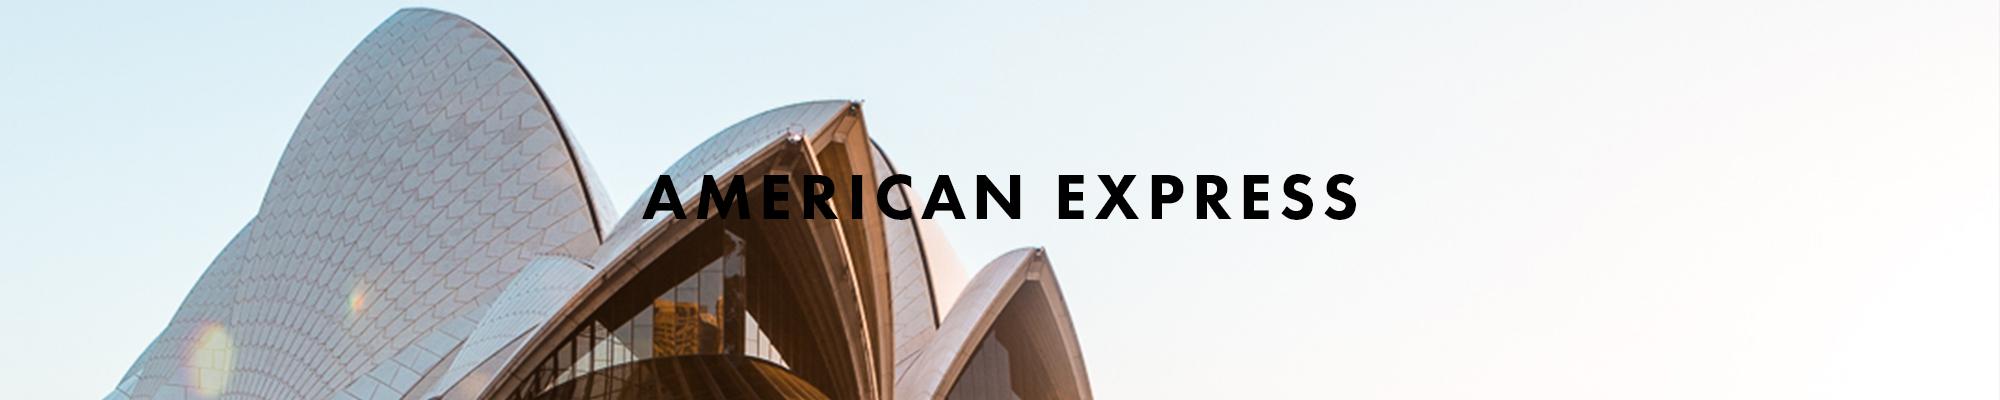 American Express Banner.jpg